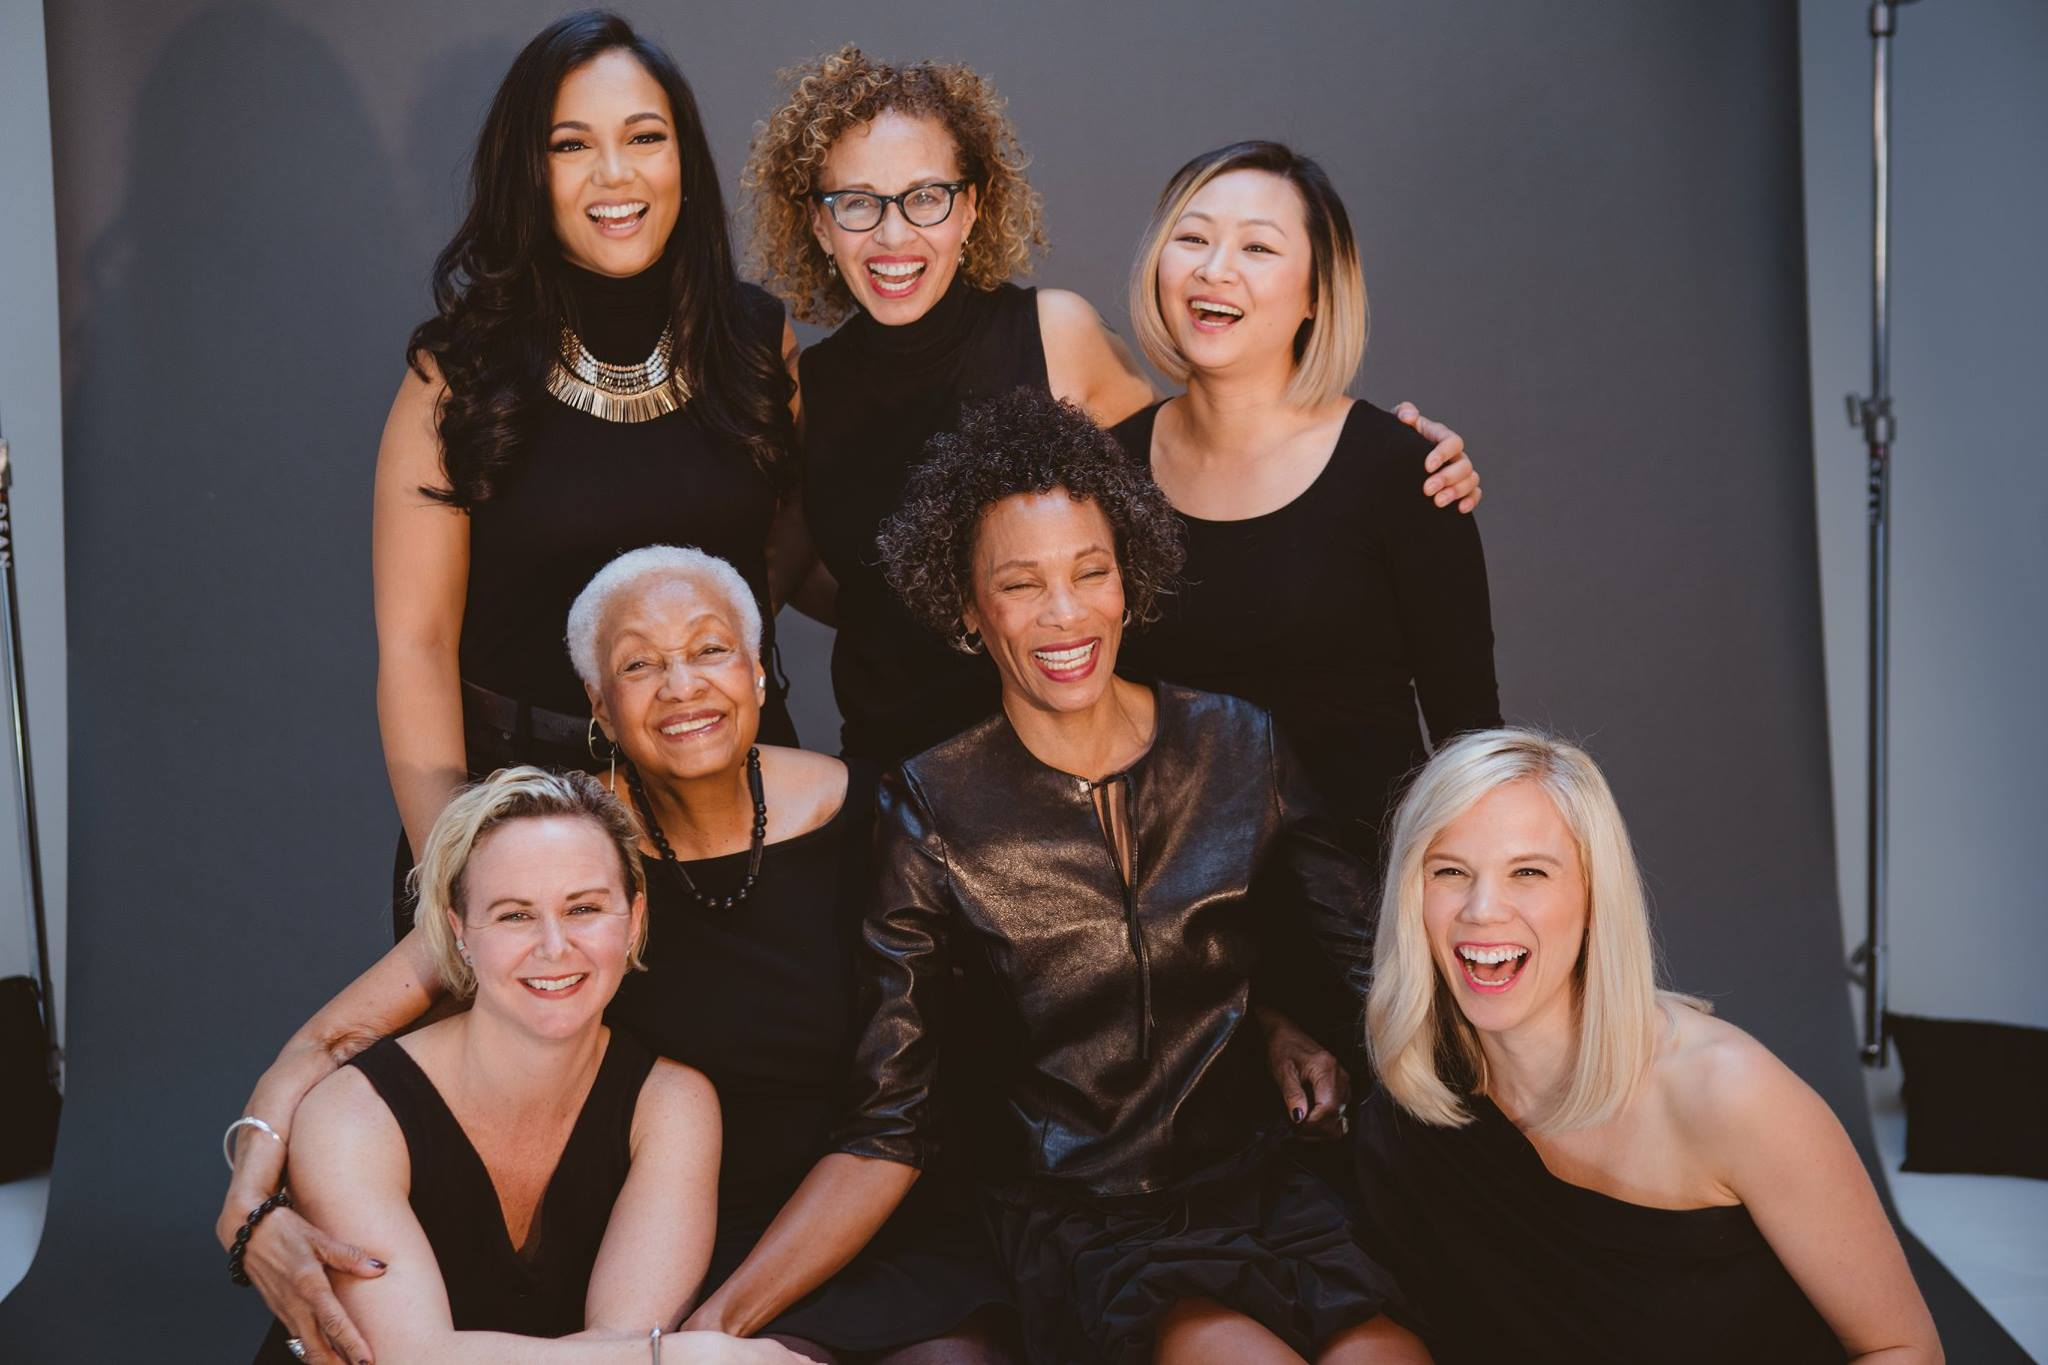 Komal, Linda, Annie, Crista, Clara, Alicia and Amanda- just a few of the extraordinary women featured in Dream, Girl.